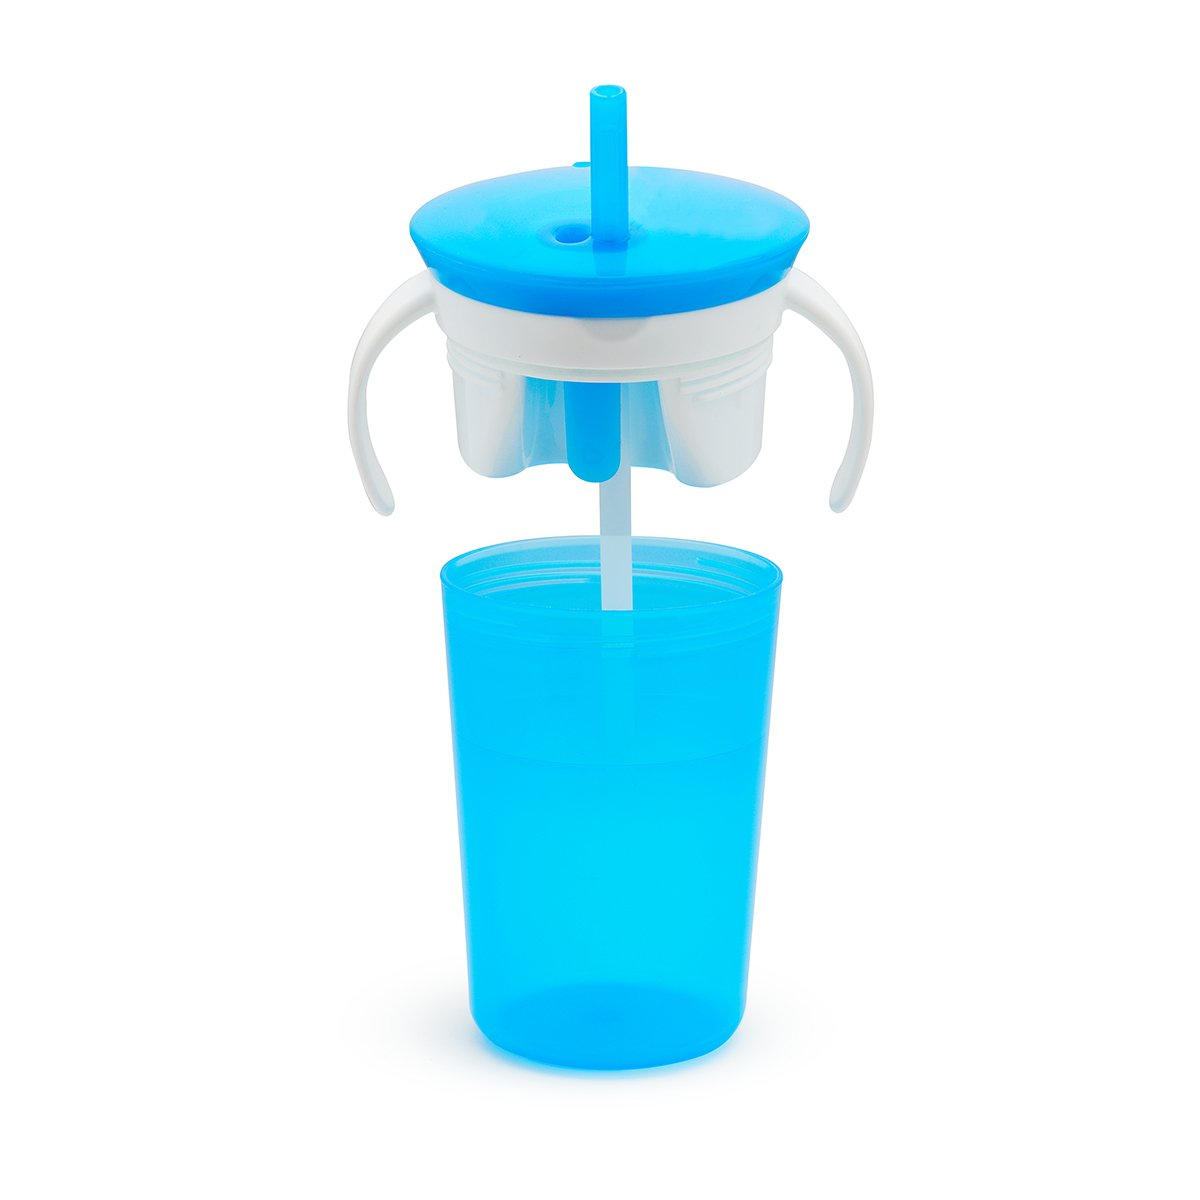 Munchkin Tasse dApprentissage Sippy Snack Cup Rose 266 ml